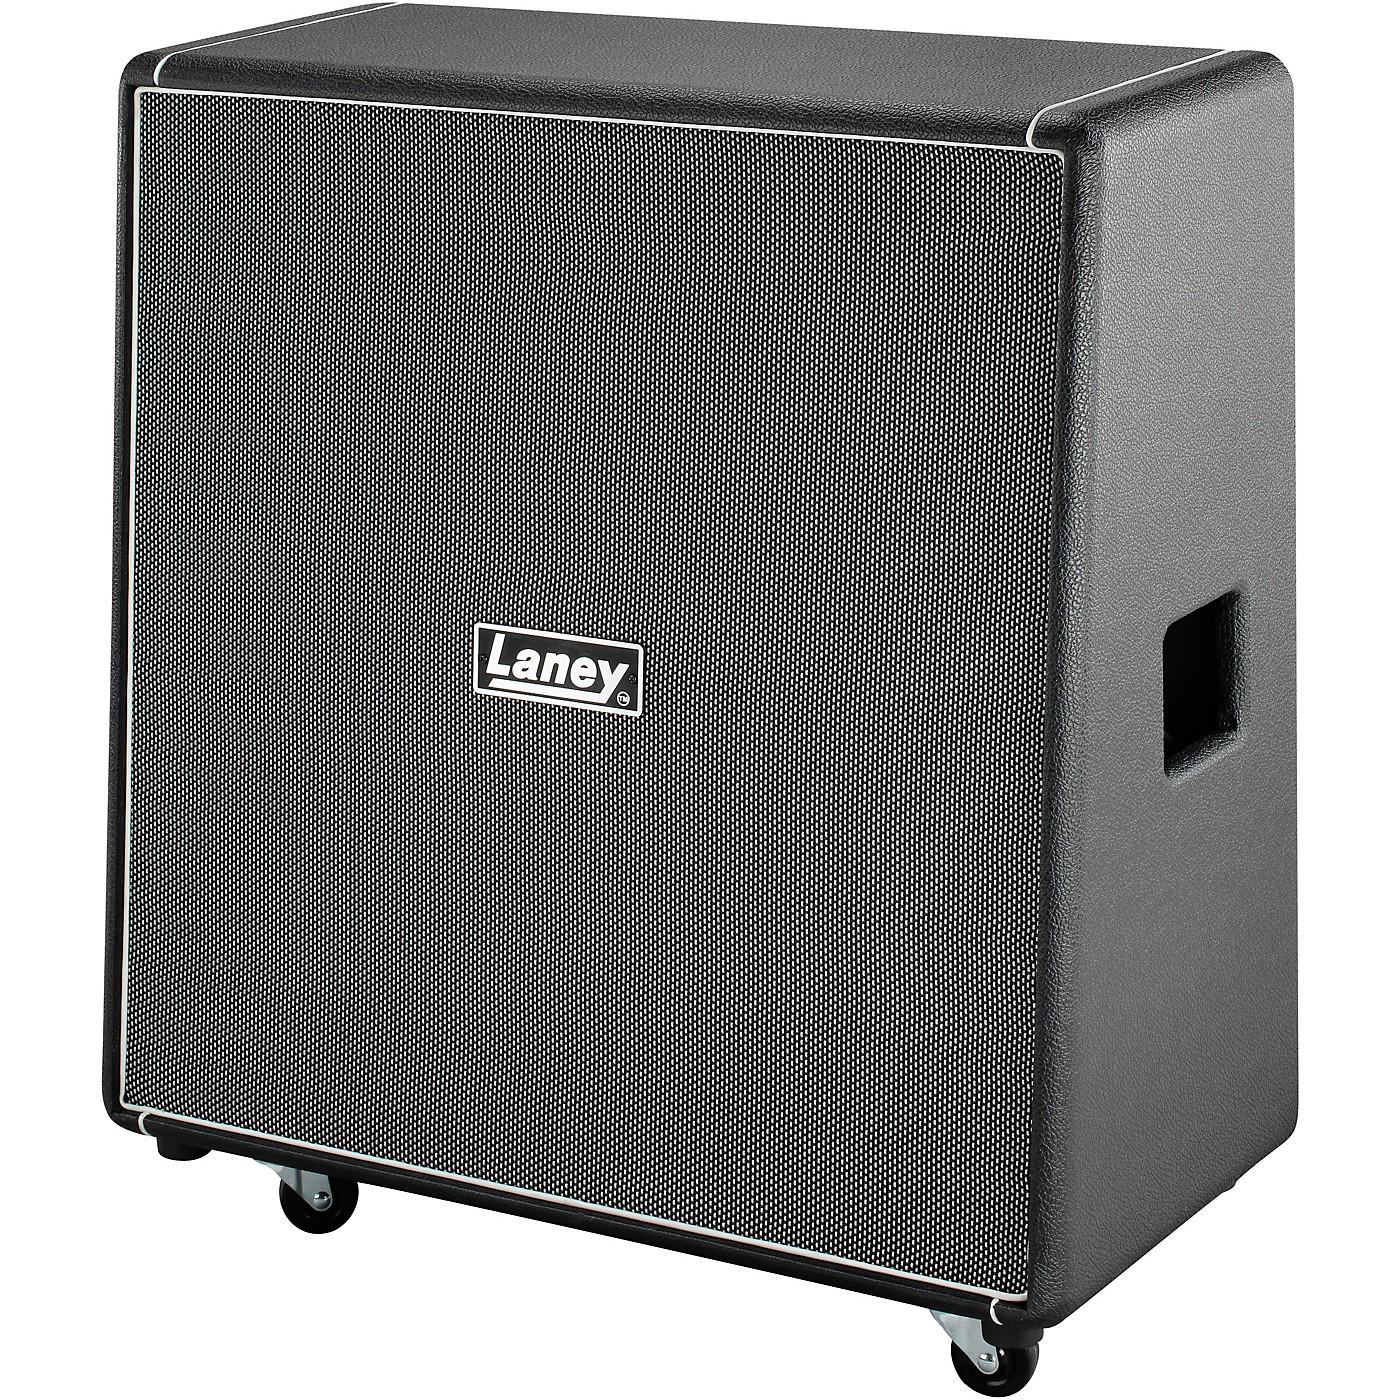 Laney LA212 50W 2x12 Slant Guitar Speaker Cab thumbnail